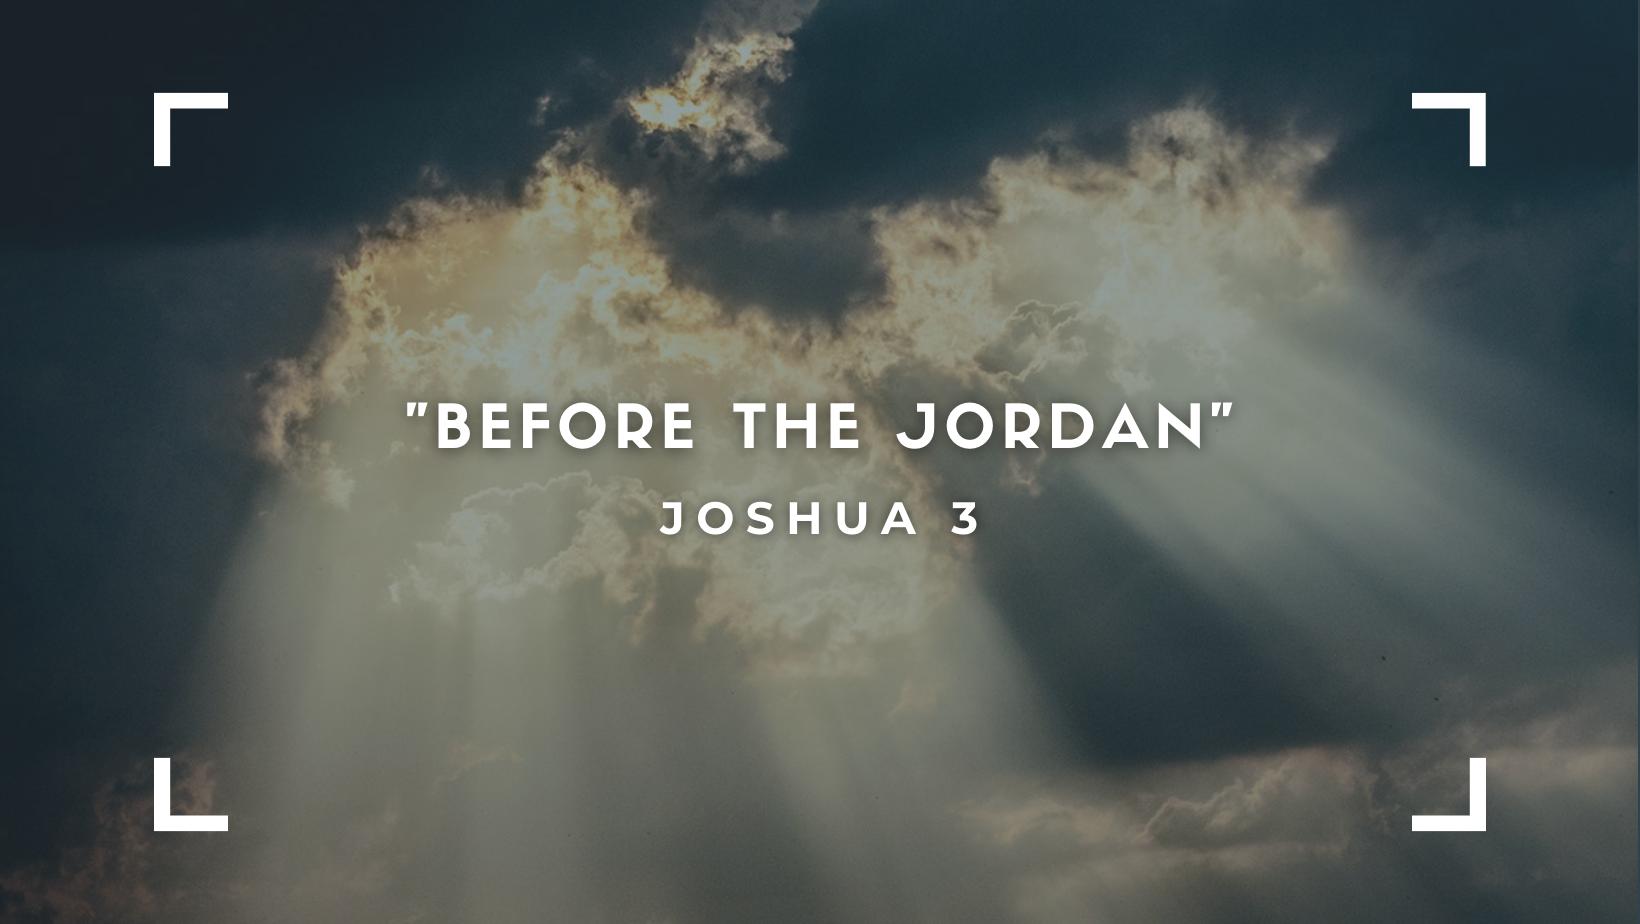 Before the Jordan